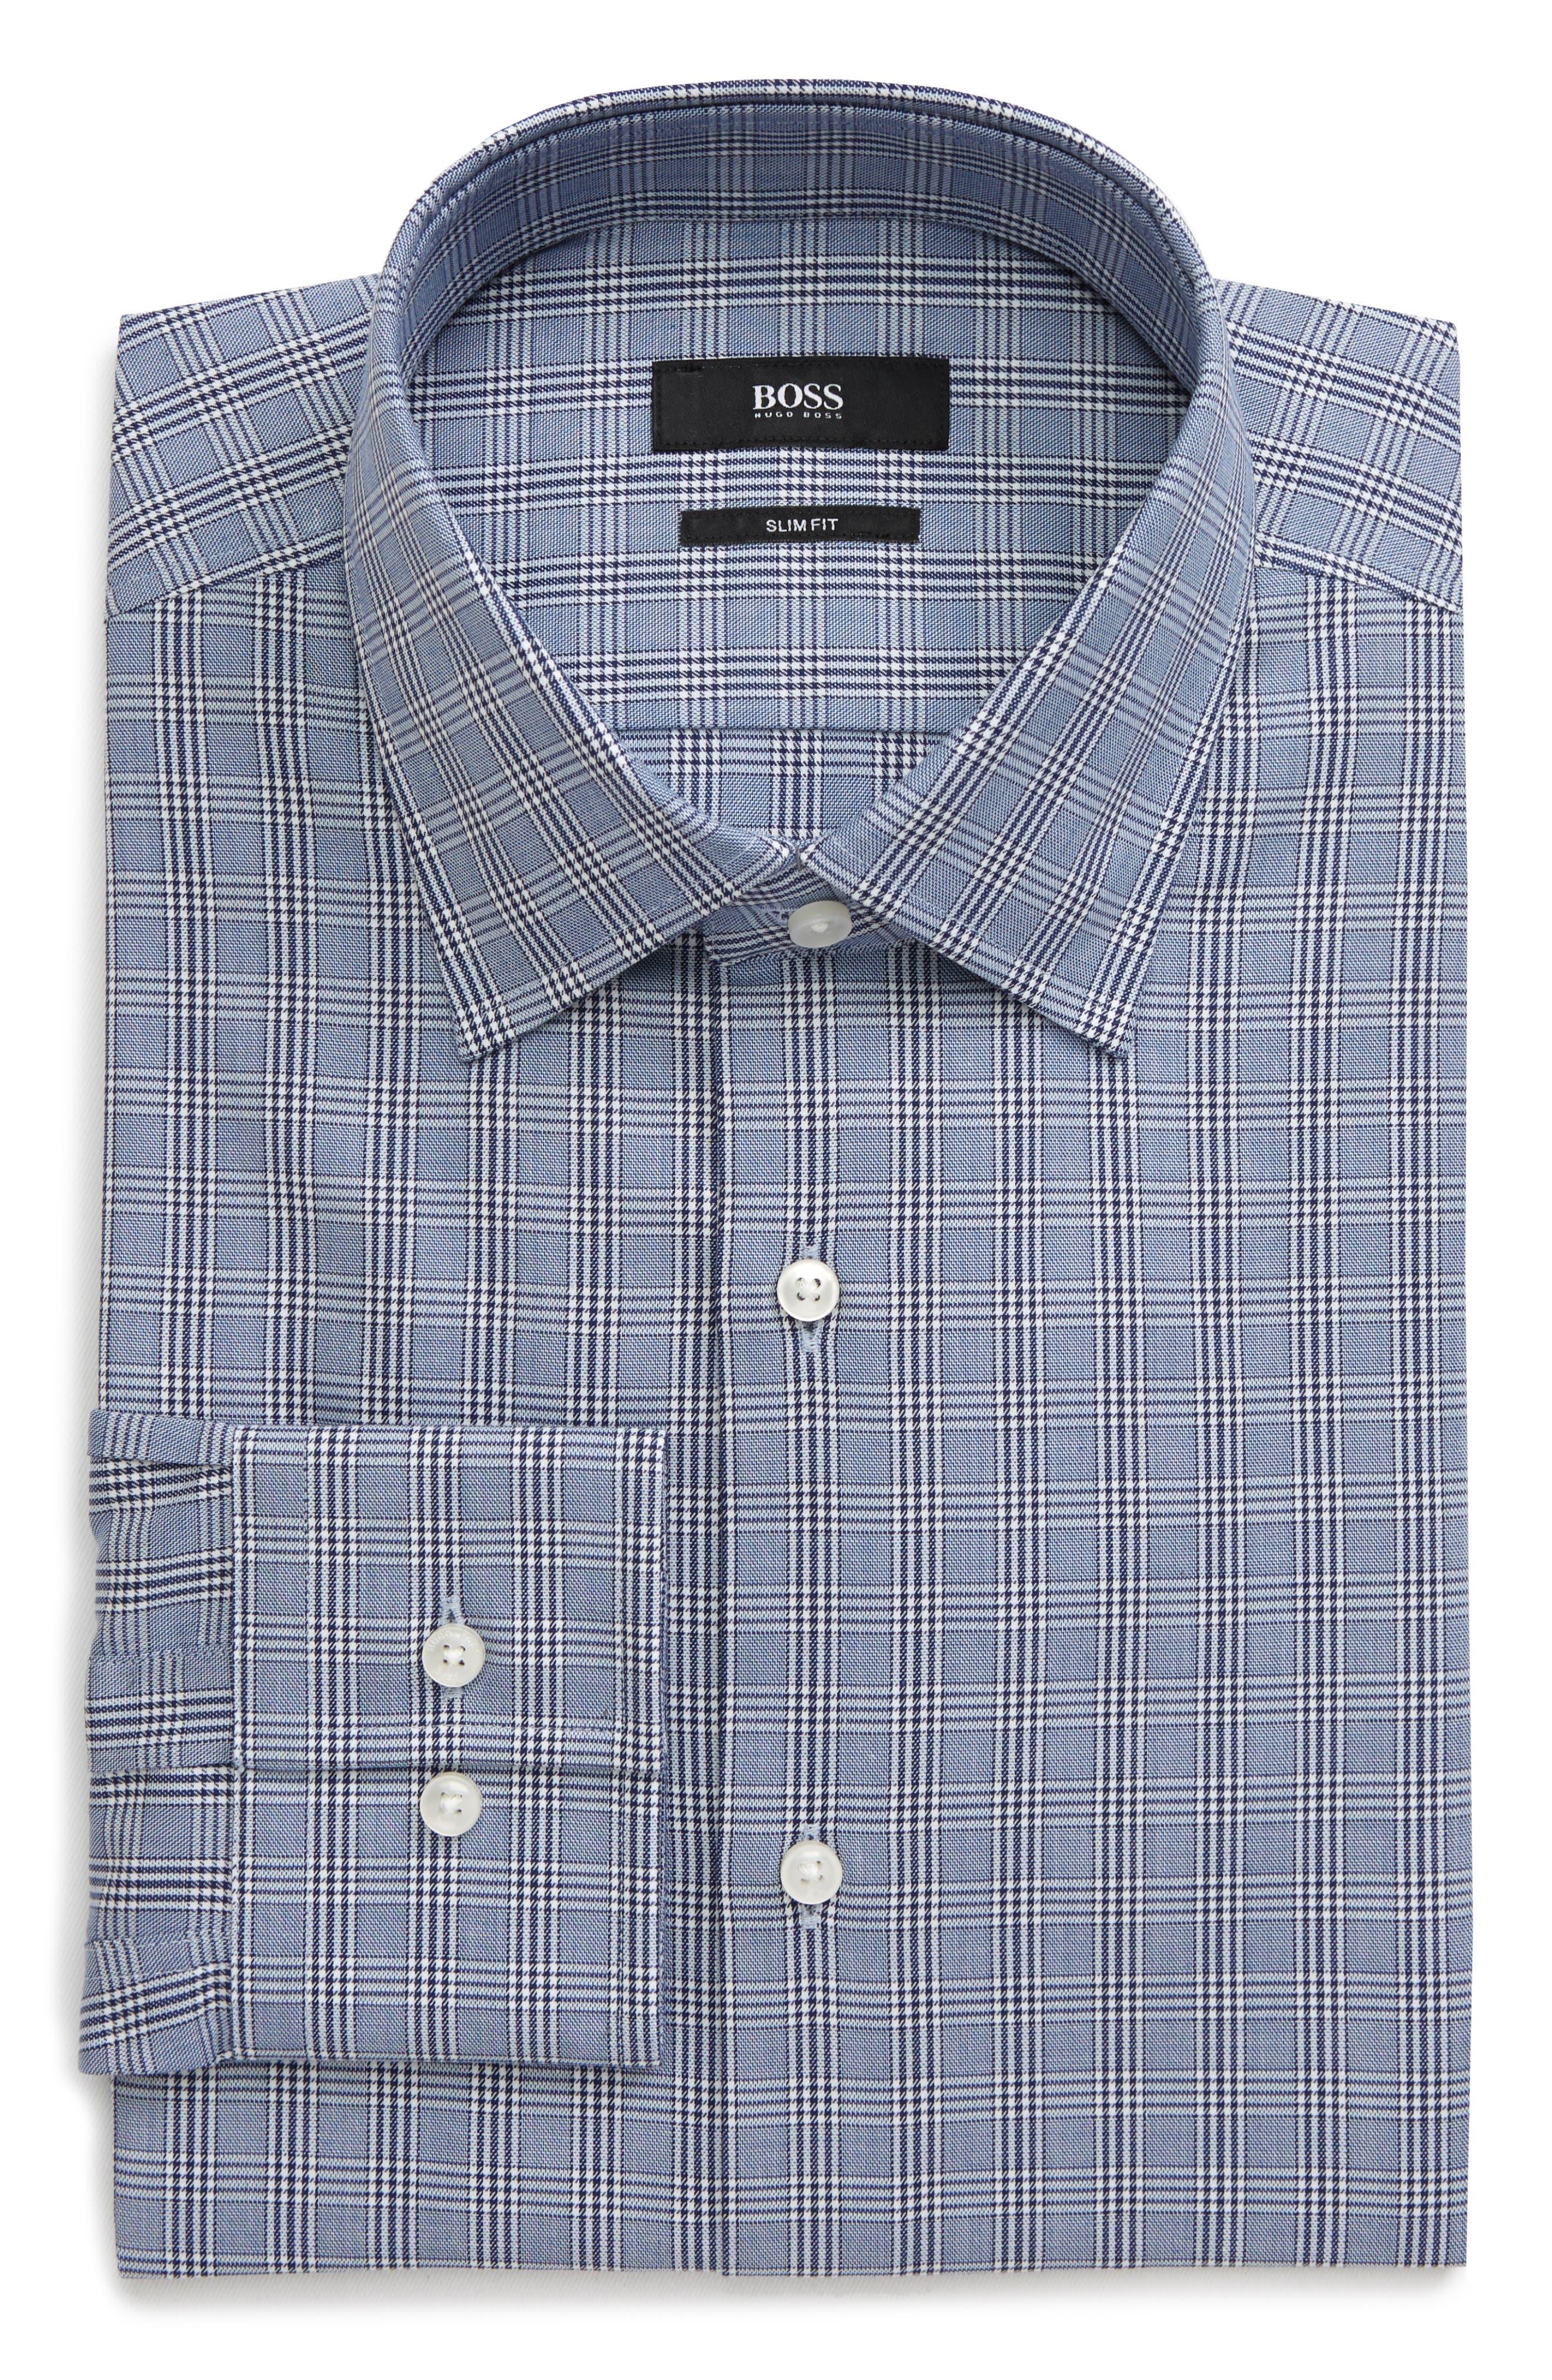 Image of BOSS Slim Fit Plaid Dress Shirt